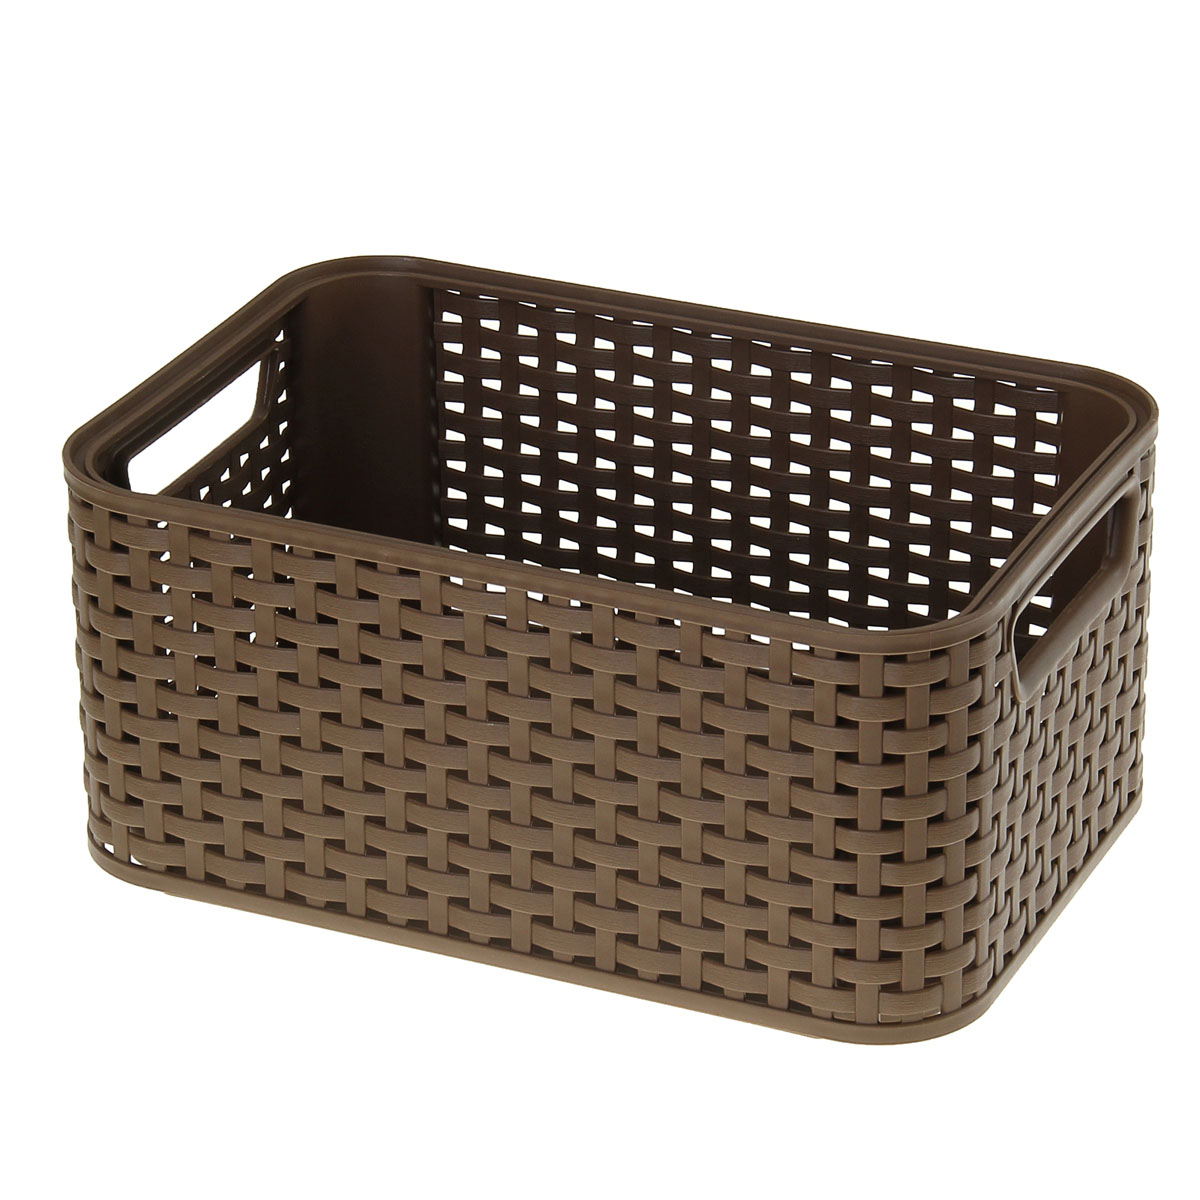 коробка для хранения curver usa flag 39 см х 29 23 см Корзинка Curver, цвет: коричневый, 29 х 19 х 13 см